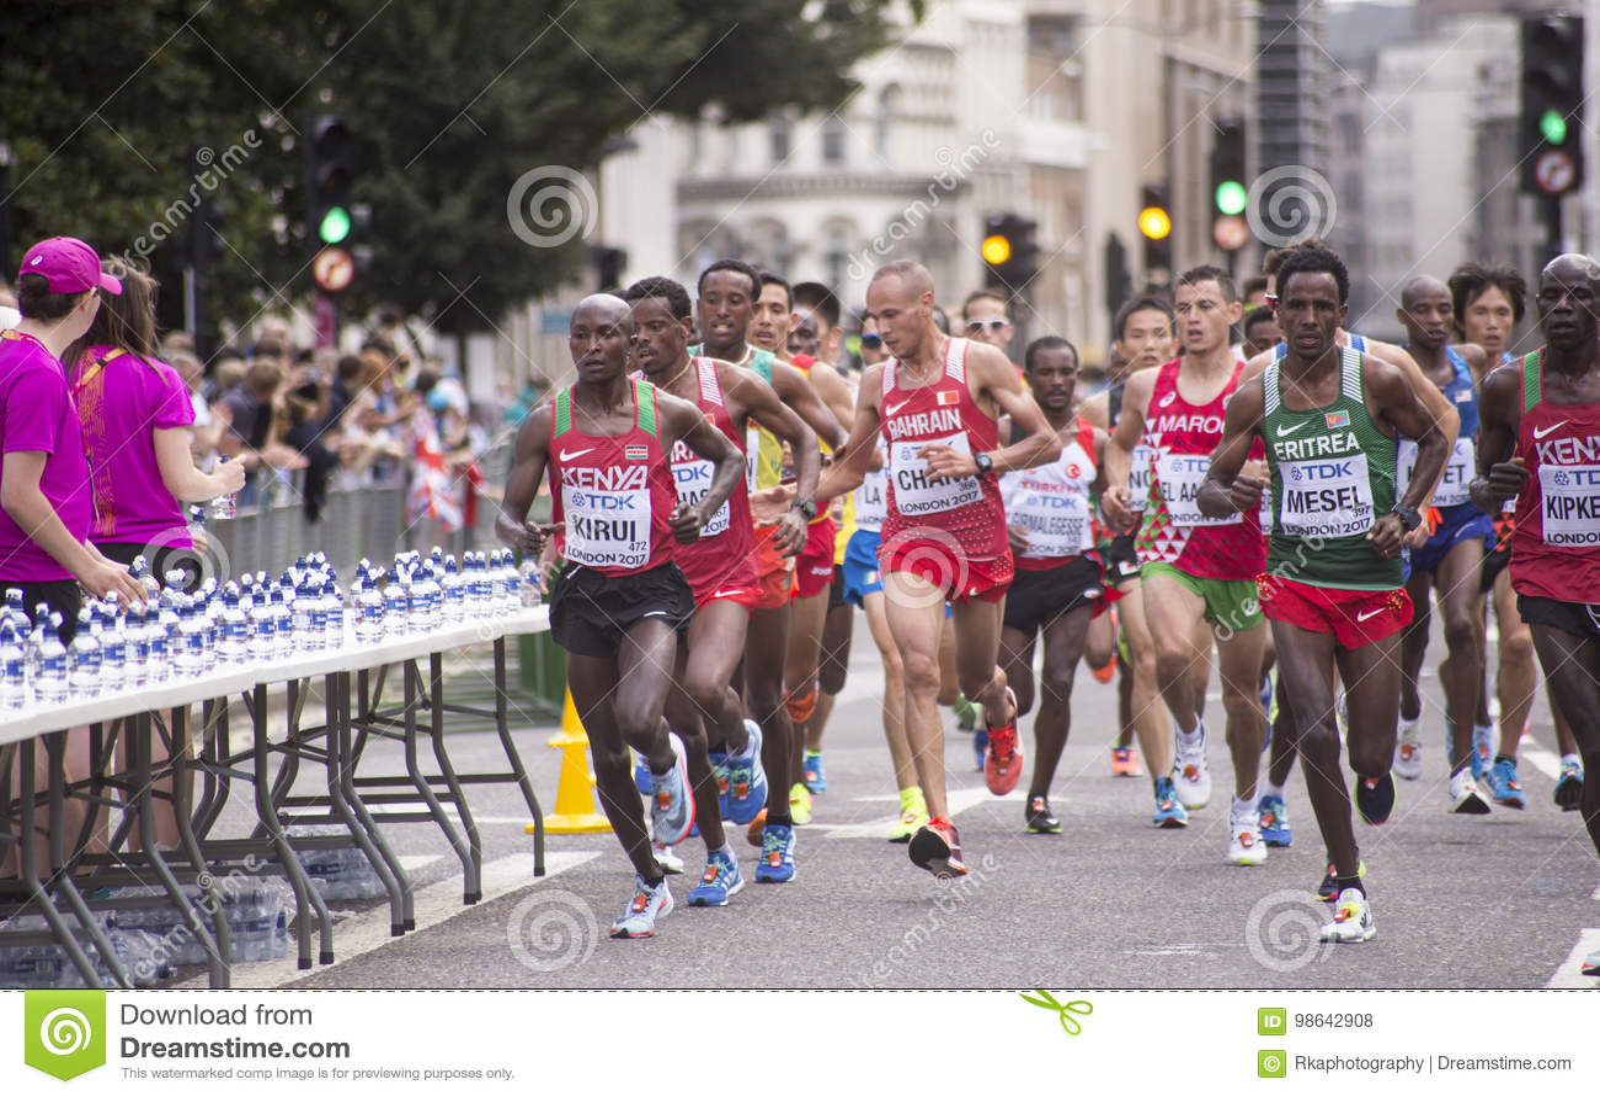 6 de agosto ` 17 - maratona dos campeonatos do atletismo do mundo de Londres: Geoffrey KIRUI